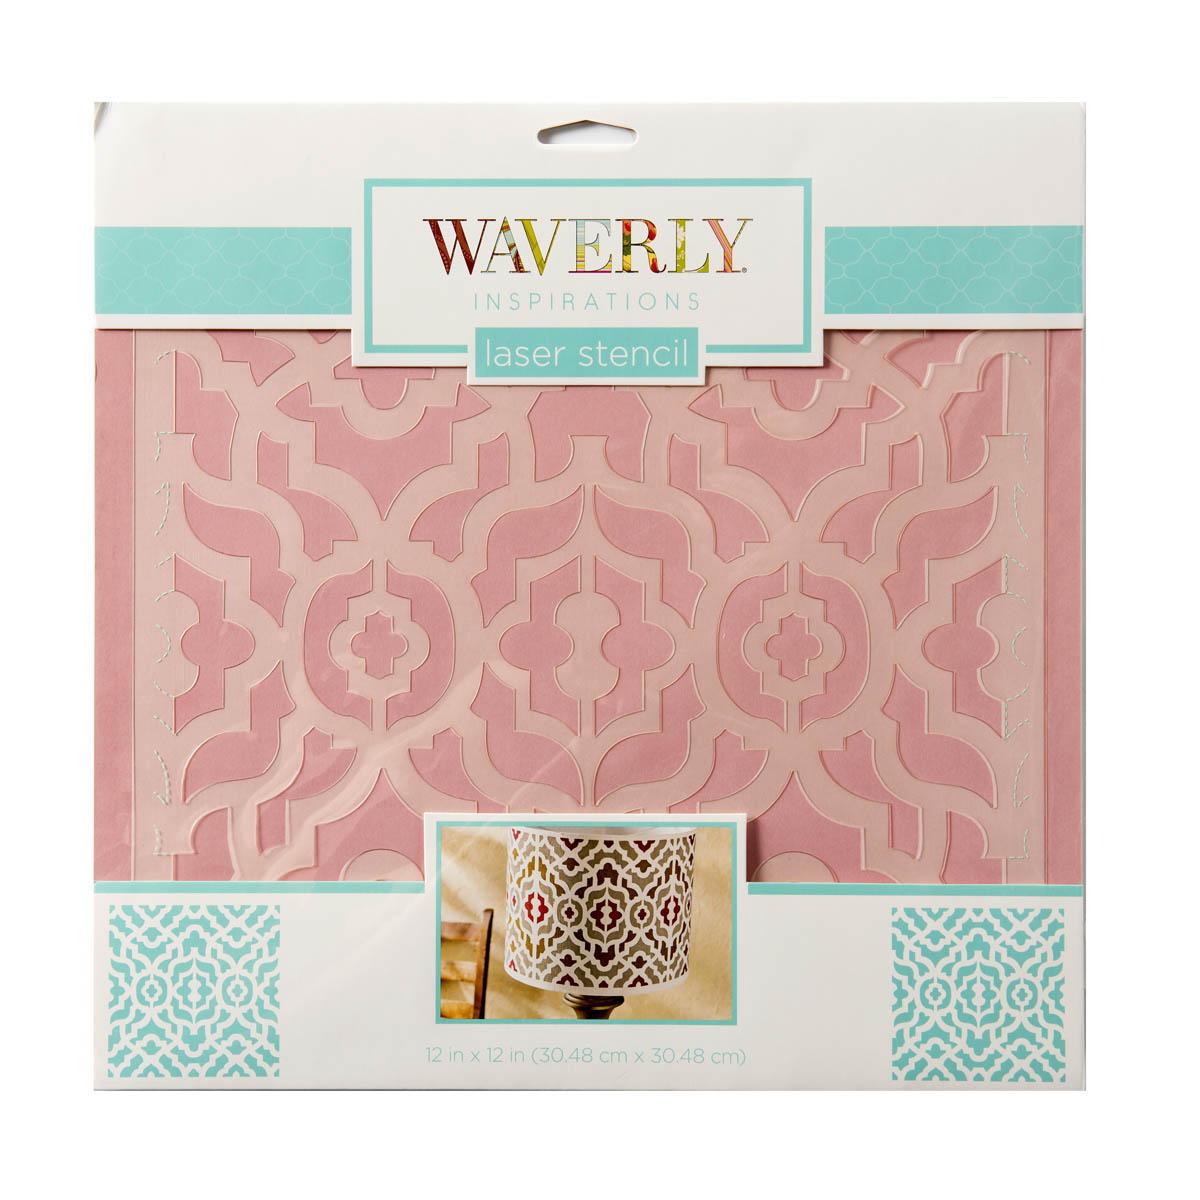 Waverly ® Inspirations Laser Stencils - Décor - Lattice, 12